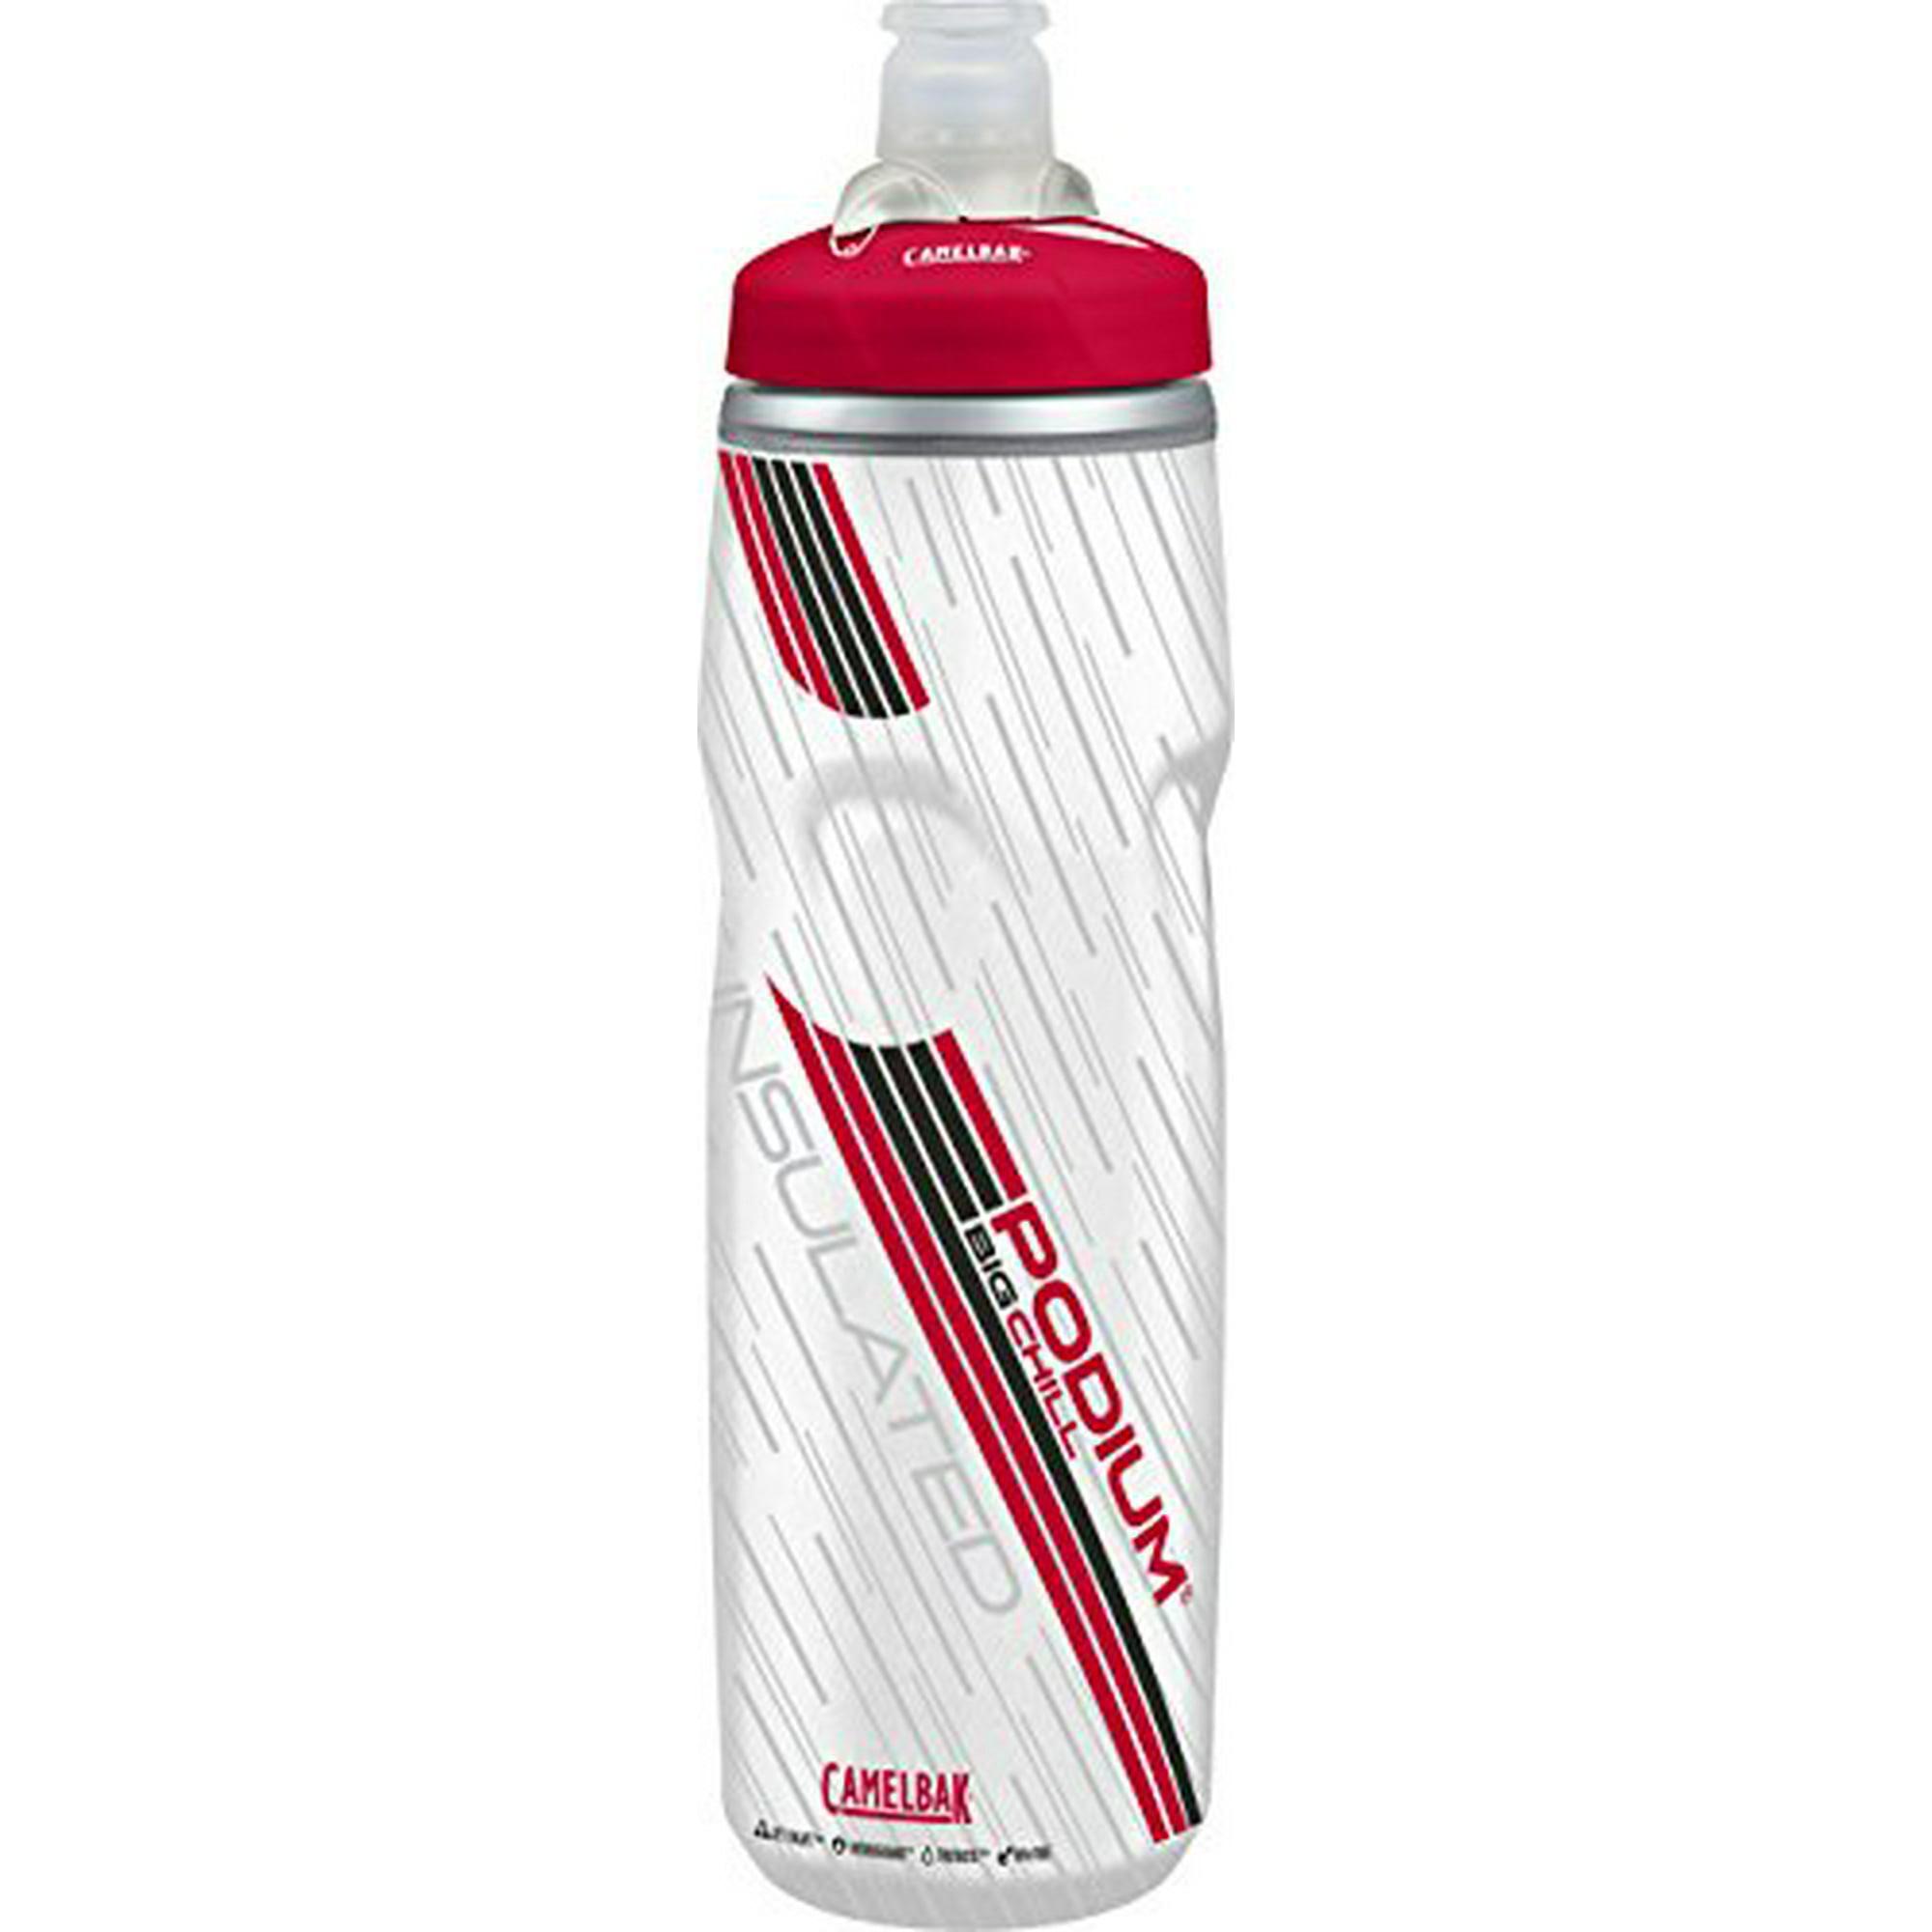 1a8eca0b0d CamelBak Podium Big Chill Insulated Water Bottle, 25 oz, Red | Walmart  Canada ?